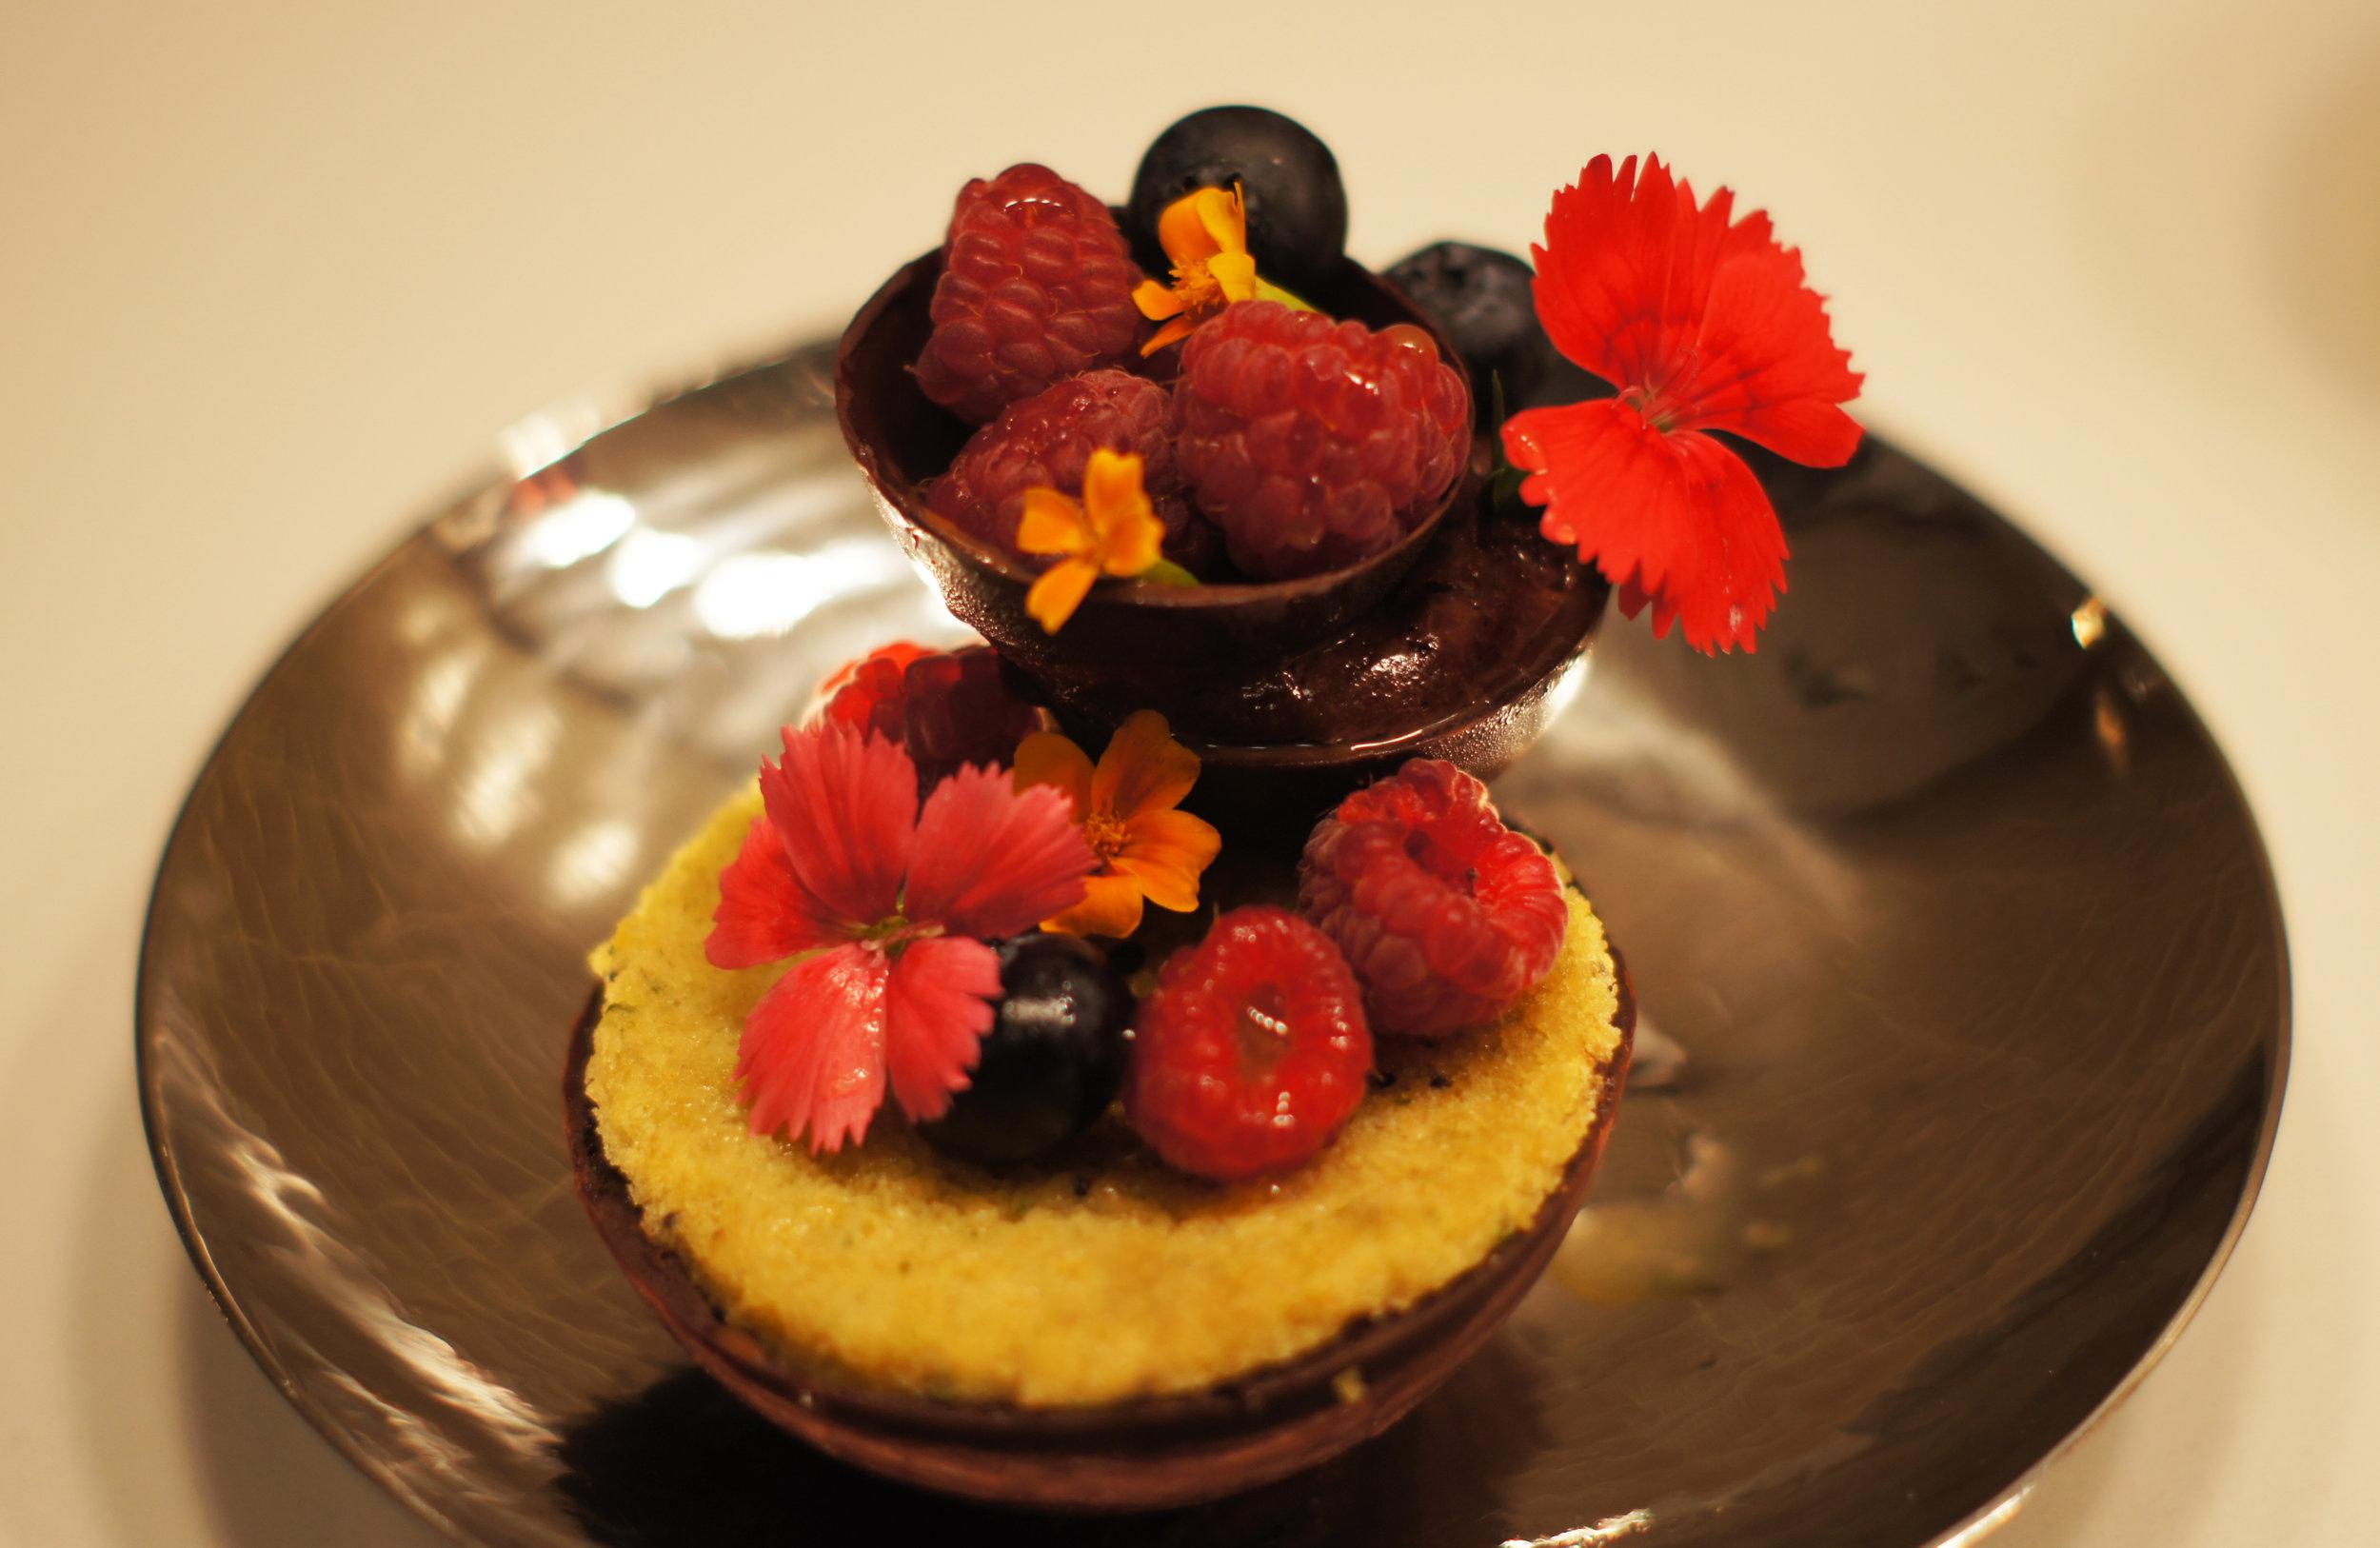 Chocolate forest 70% chocolate mousse, cilantro madeleine and raspberry gelee dessert